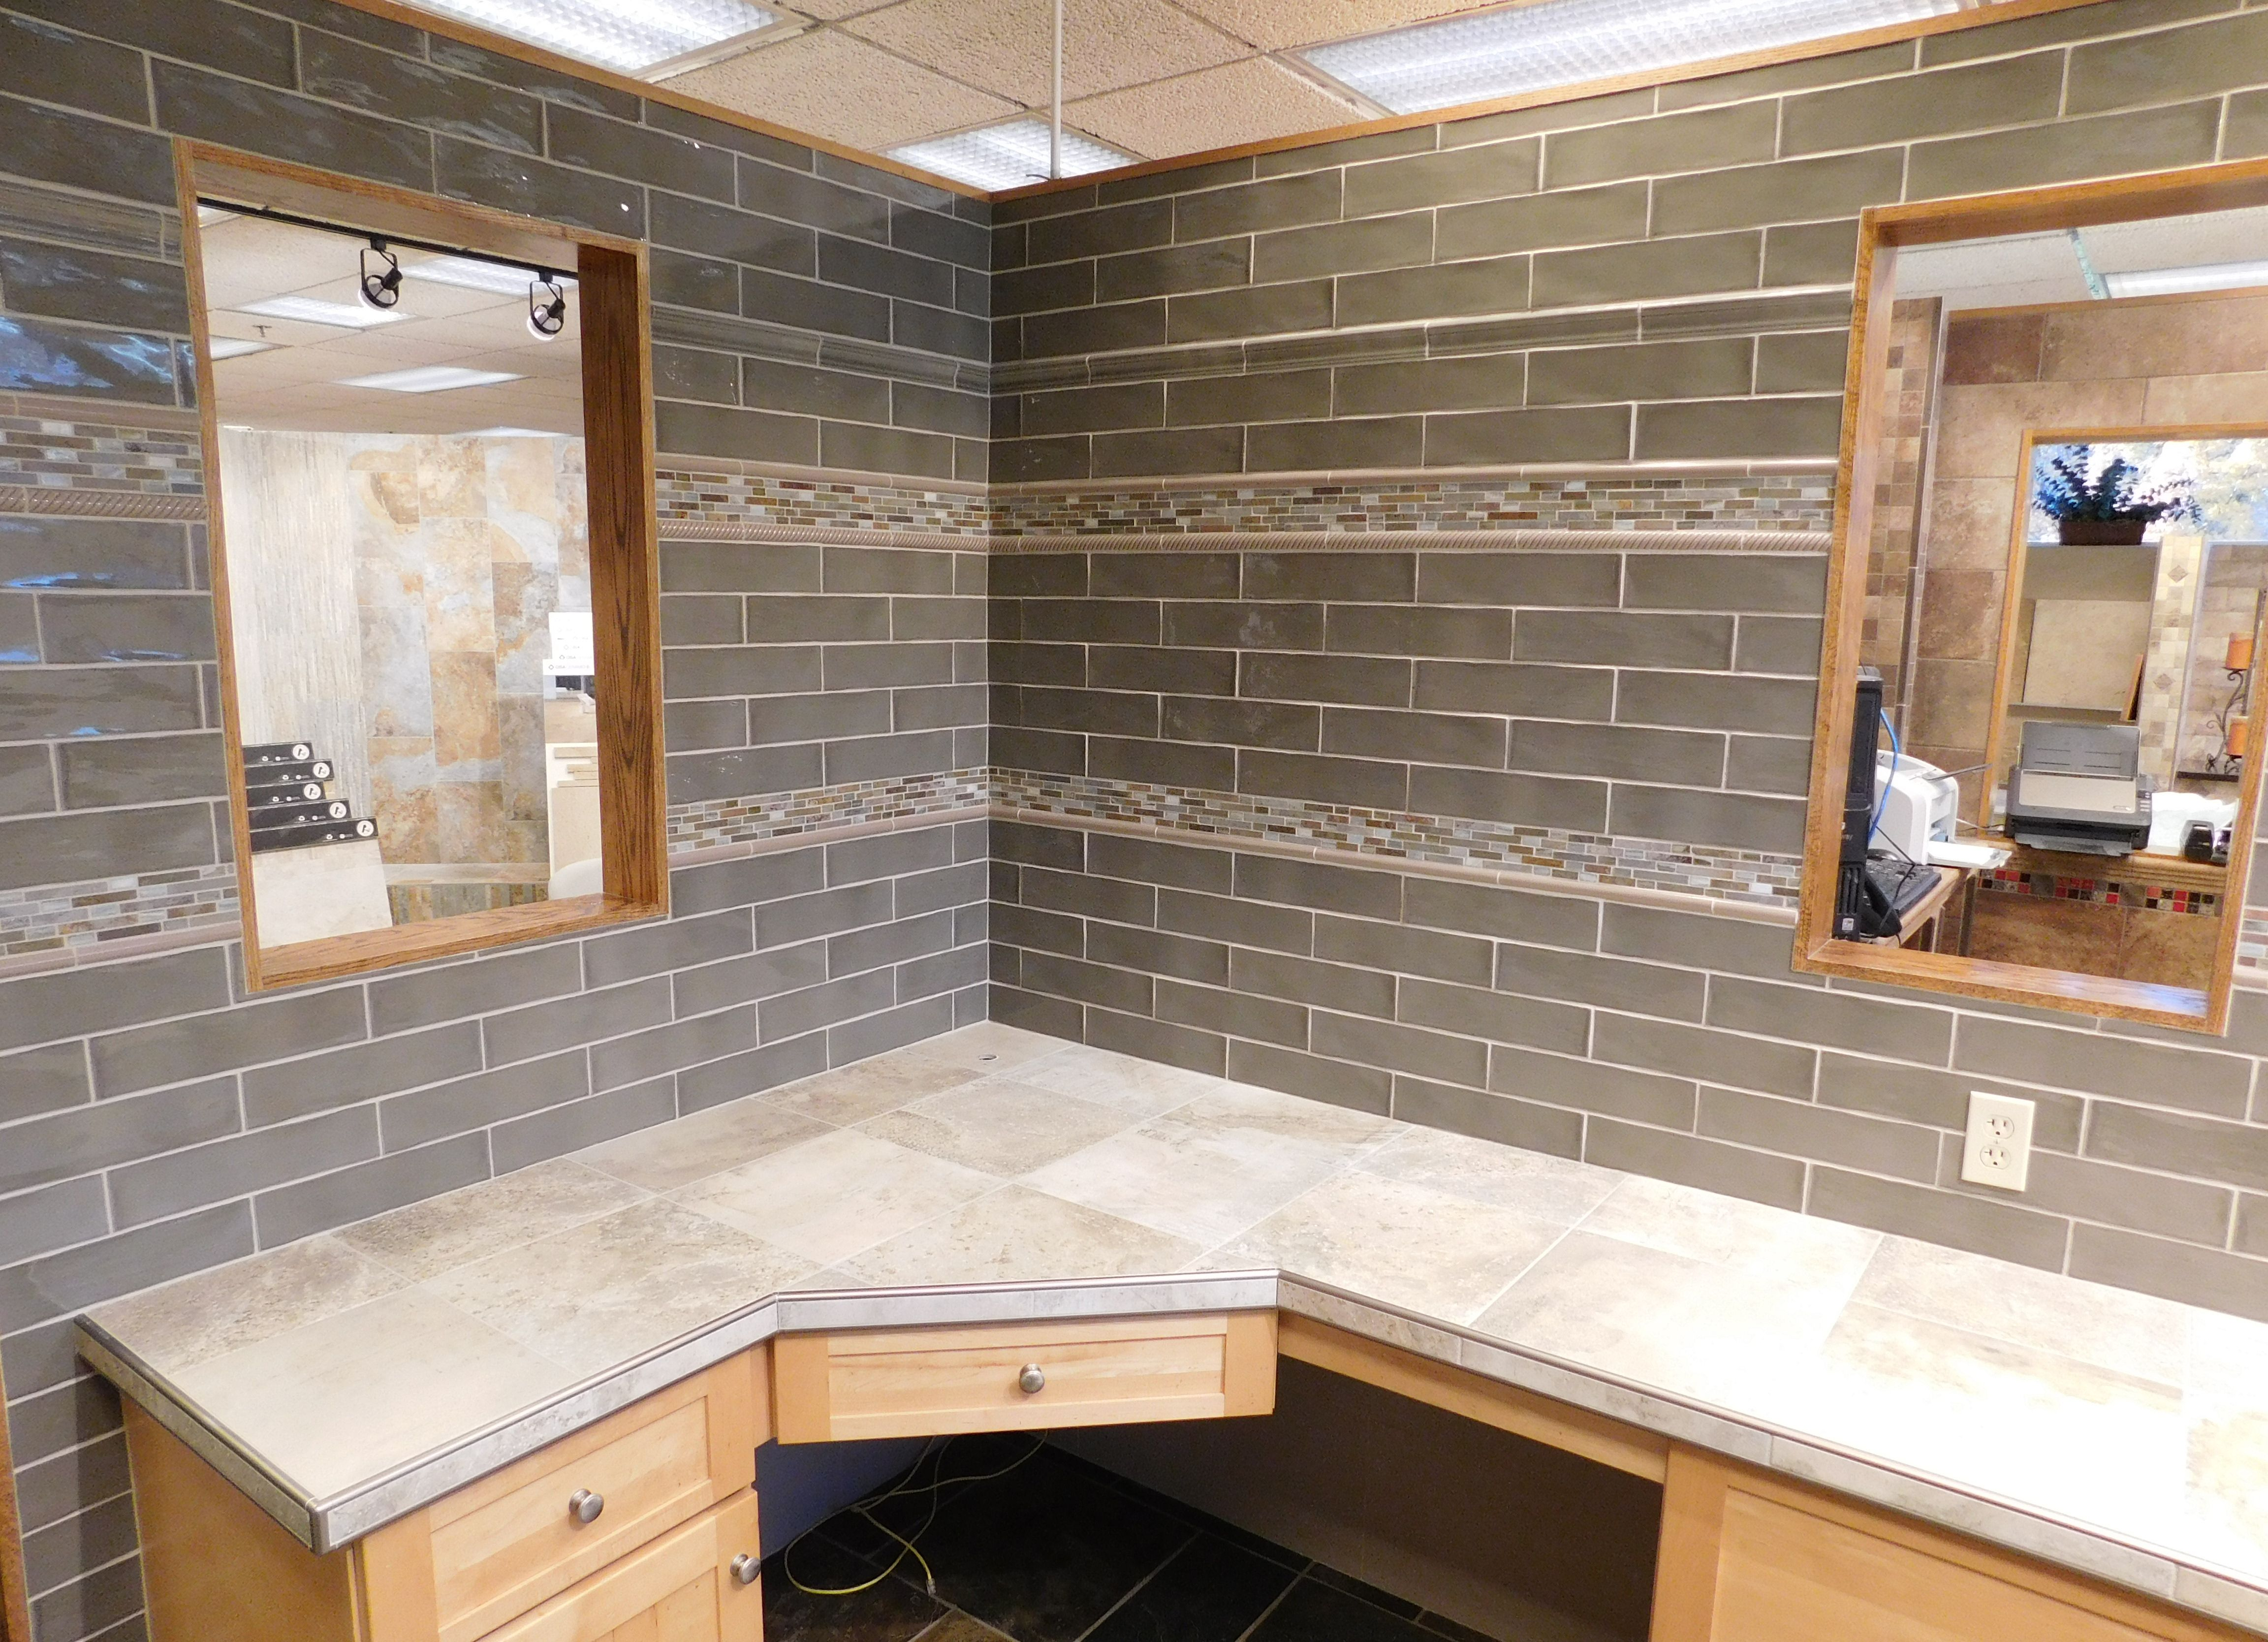 Excellent 12X24 Slate Tile Flooring Thin 13X13 Ceramic Tile Square 18 Inch Ceramic Tile 1X2 Subway Tile Old 2 X 12 Ceramic Tile Bright200X200 Floor Tiles  Sage Green Subway ..